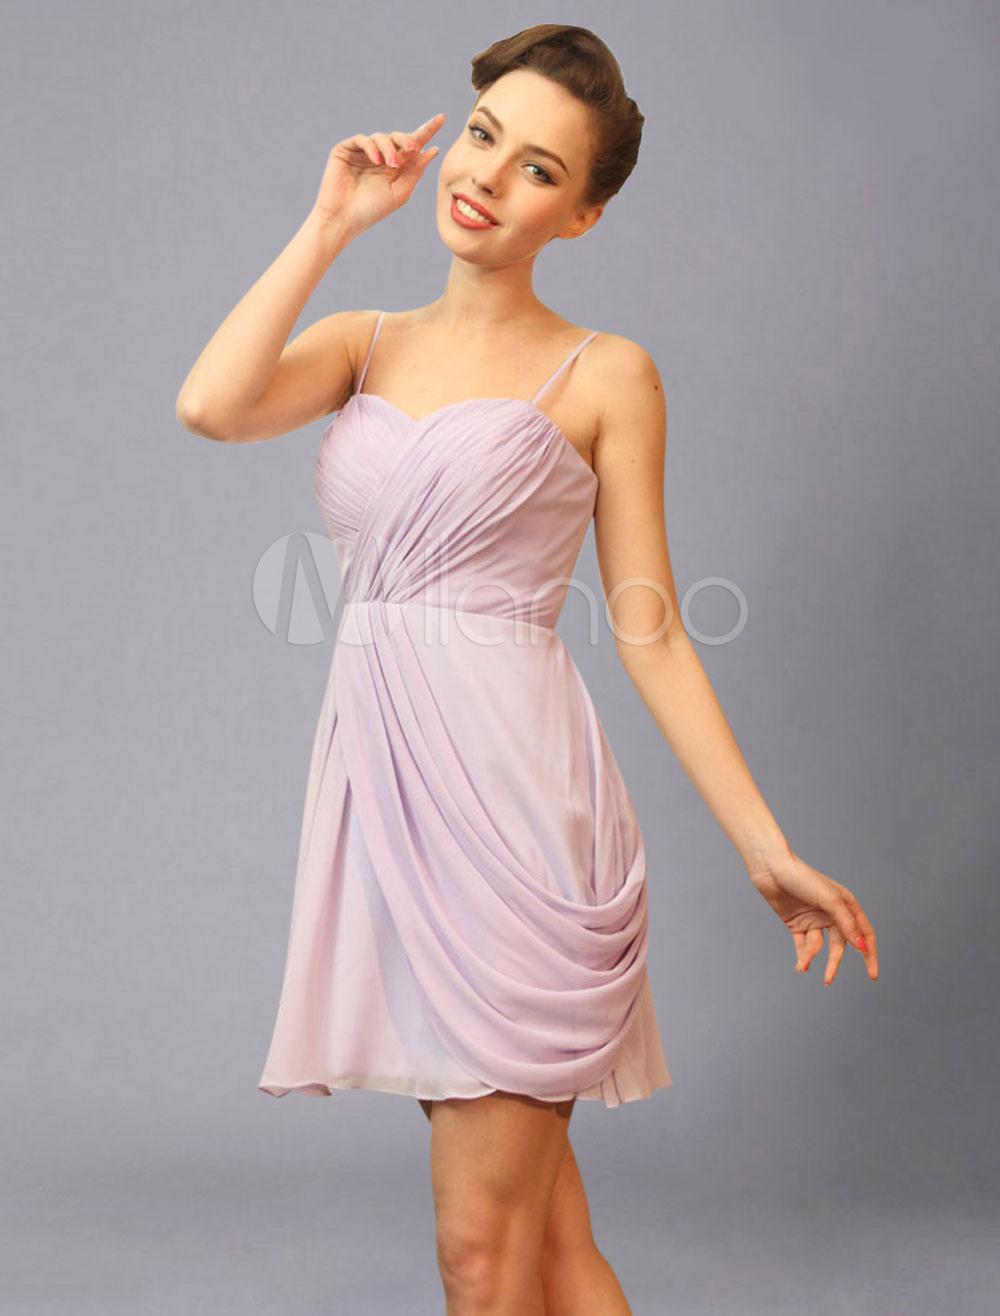 lavande demoiselle dhonneur robe sweetheart spaghetti pliss mousseline courte mariage robe de soire milanoocom - Milanoo Robe De Soiree Pour Mariage